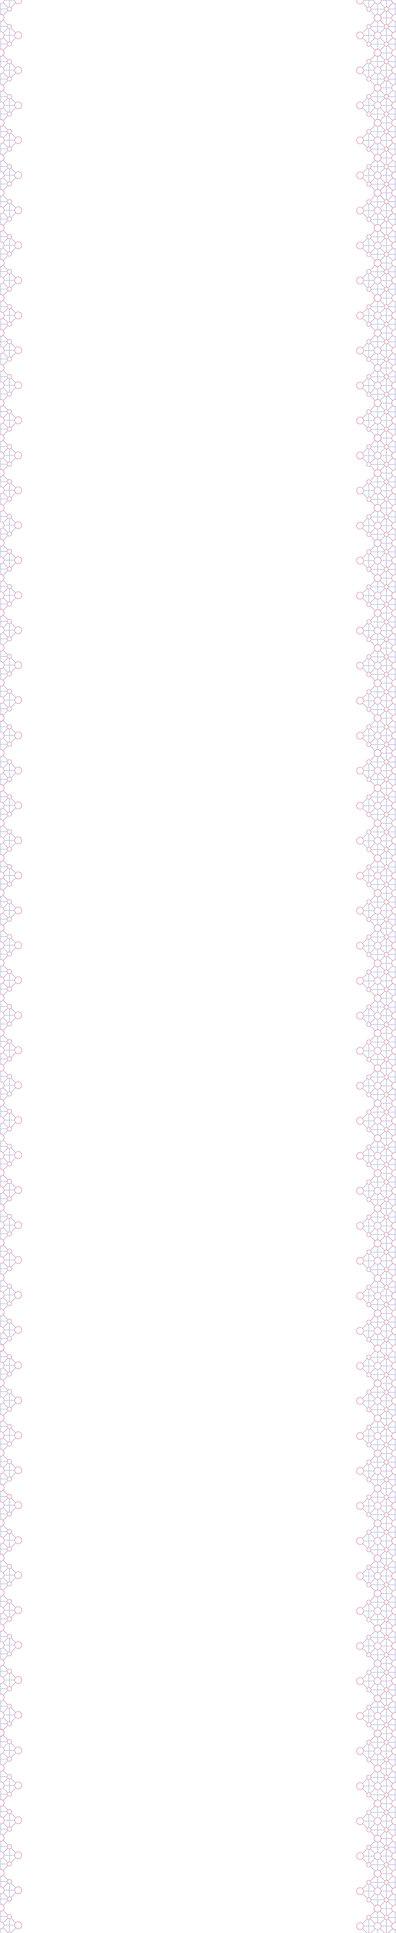 pattern bg 3-longest.jpg